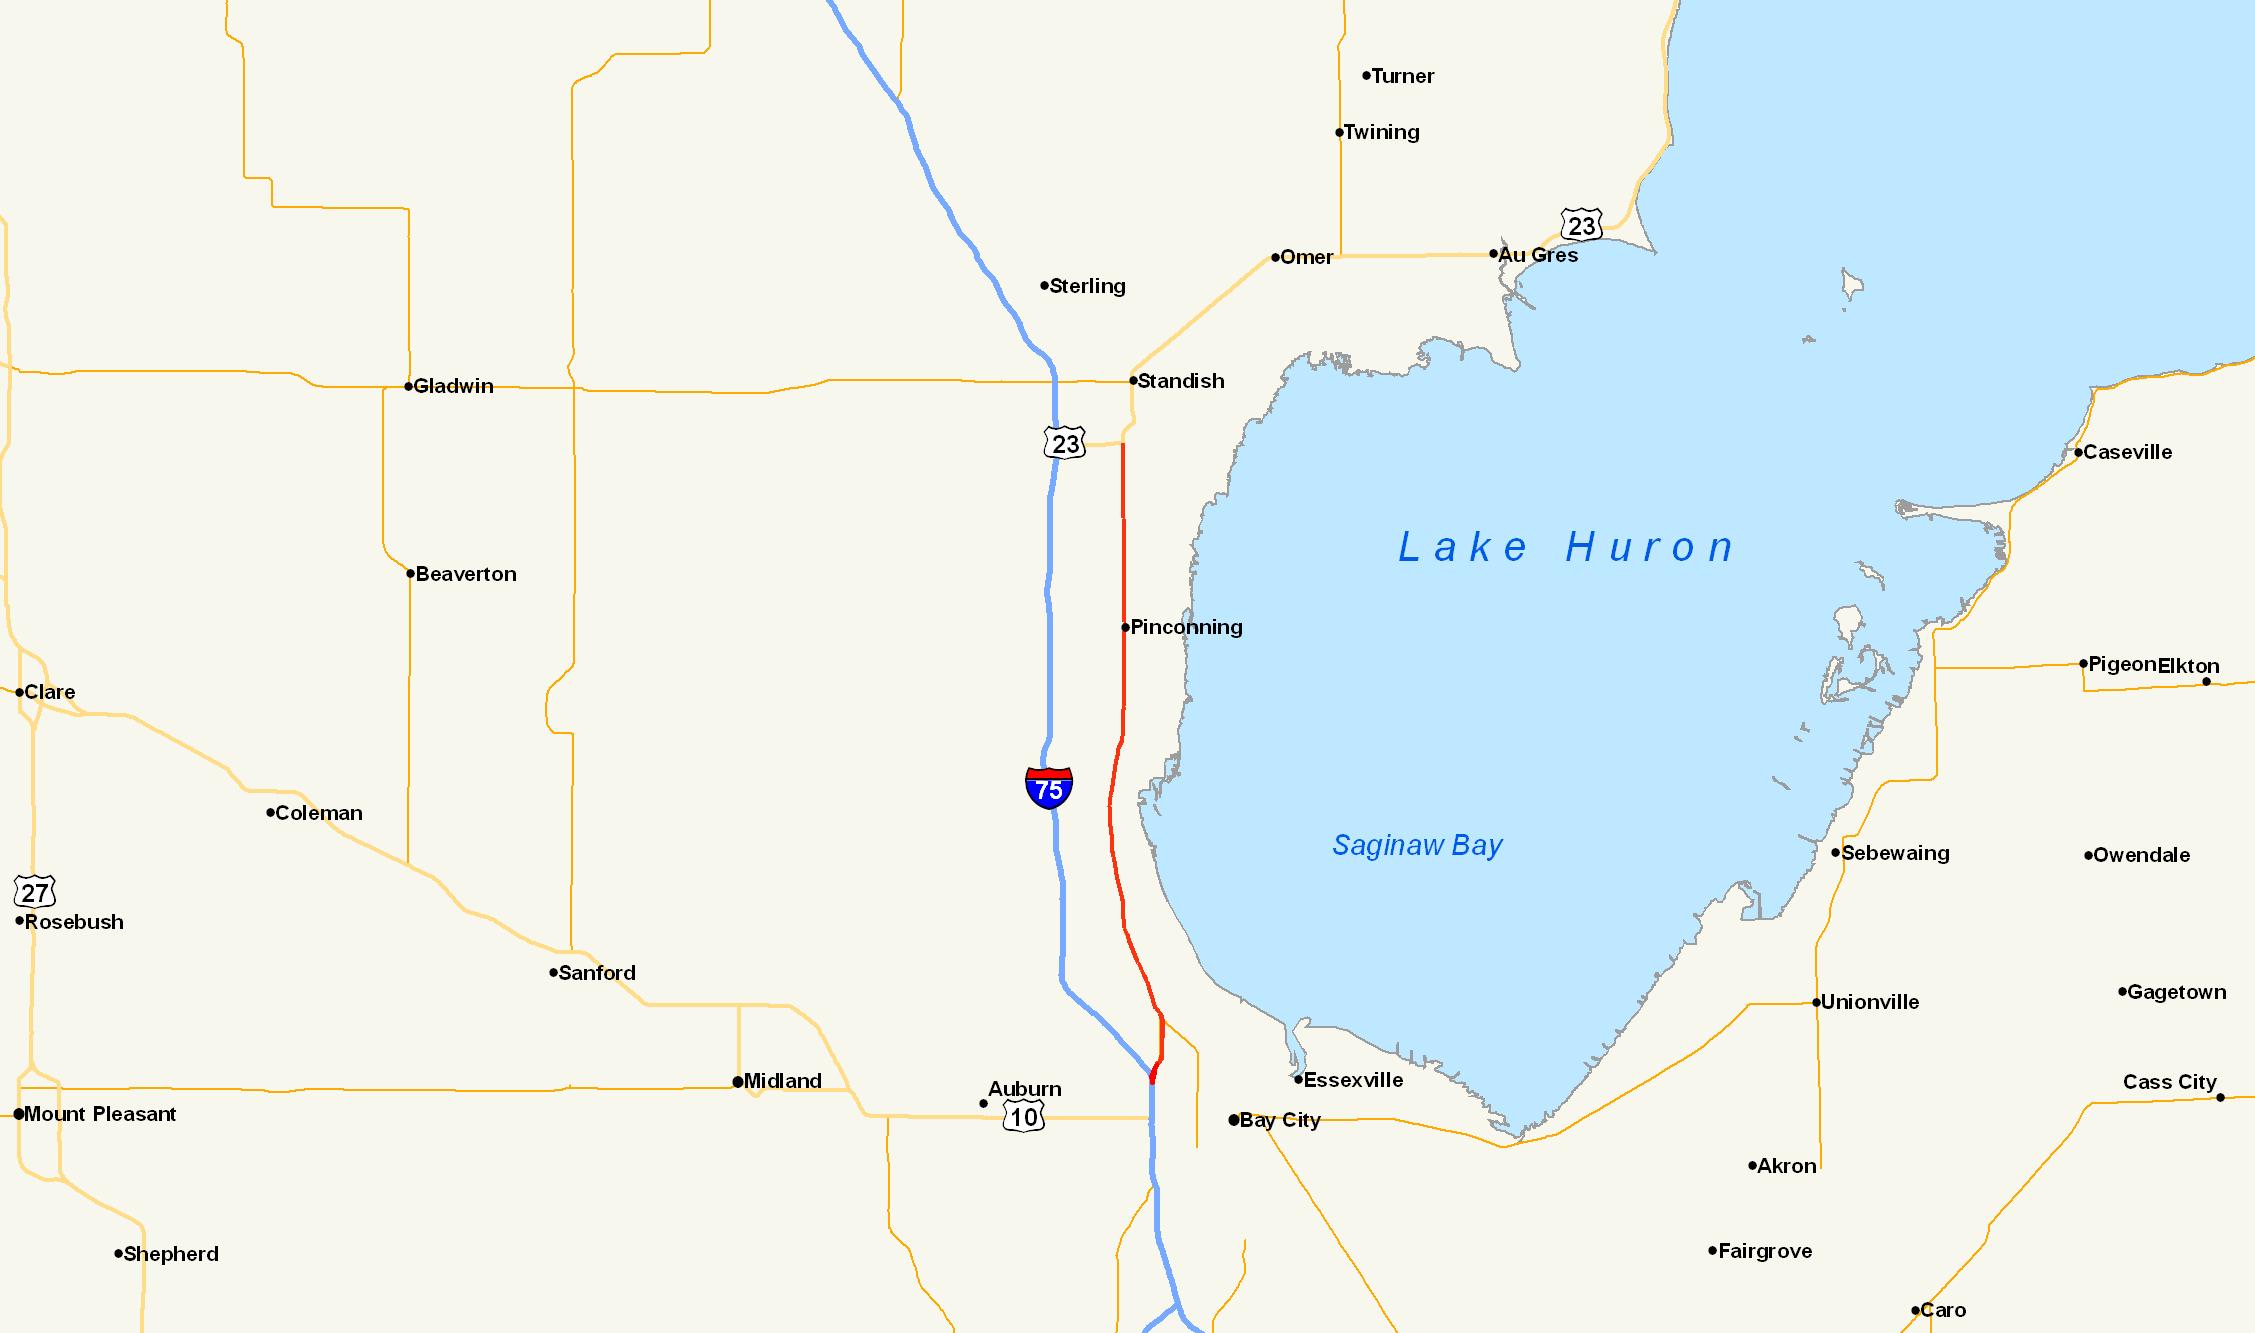 FileUS Alt Standish Michiganpng Wikimedia Commons - Us 23 michigan map